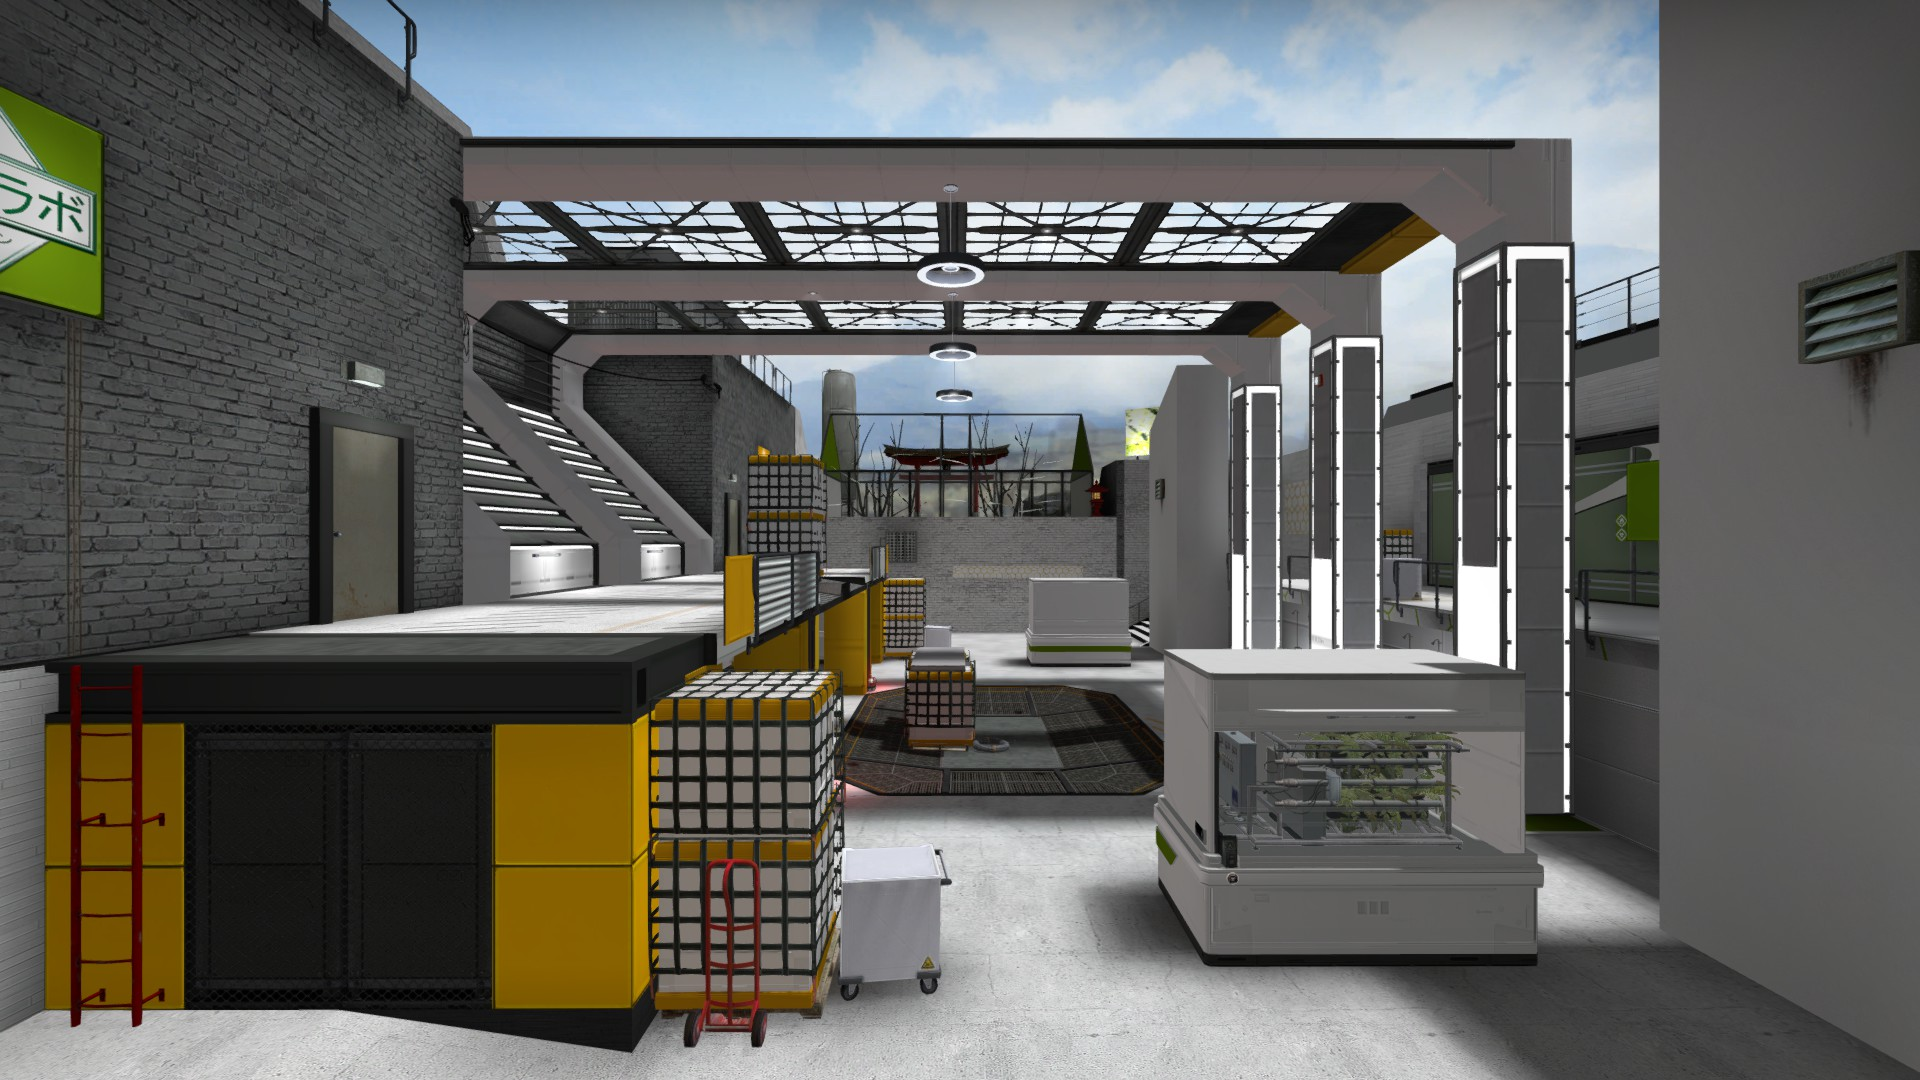 Download map aim season (Counter-Strike GO), files and screenshots